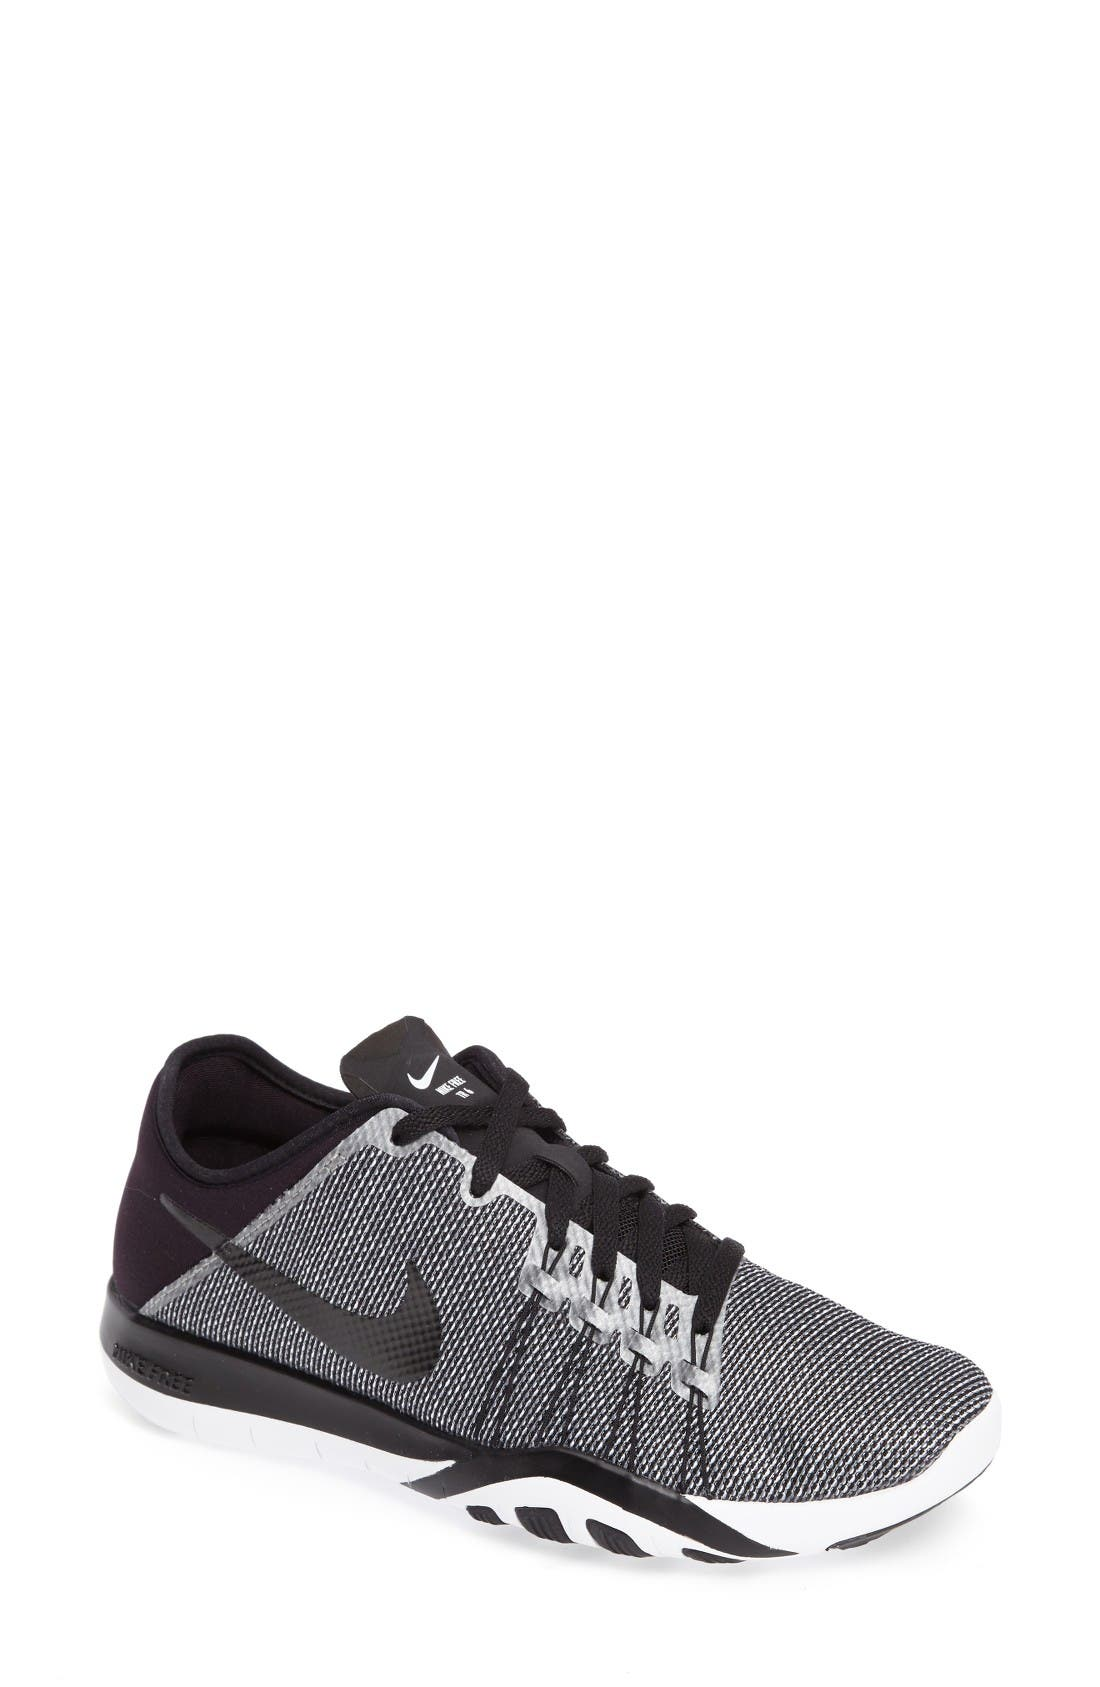 Alternate Image 1 Selected - Nike Free TR Fit 6 Training Shoe (Women)